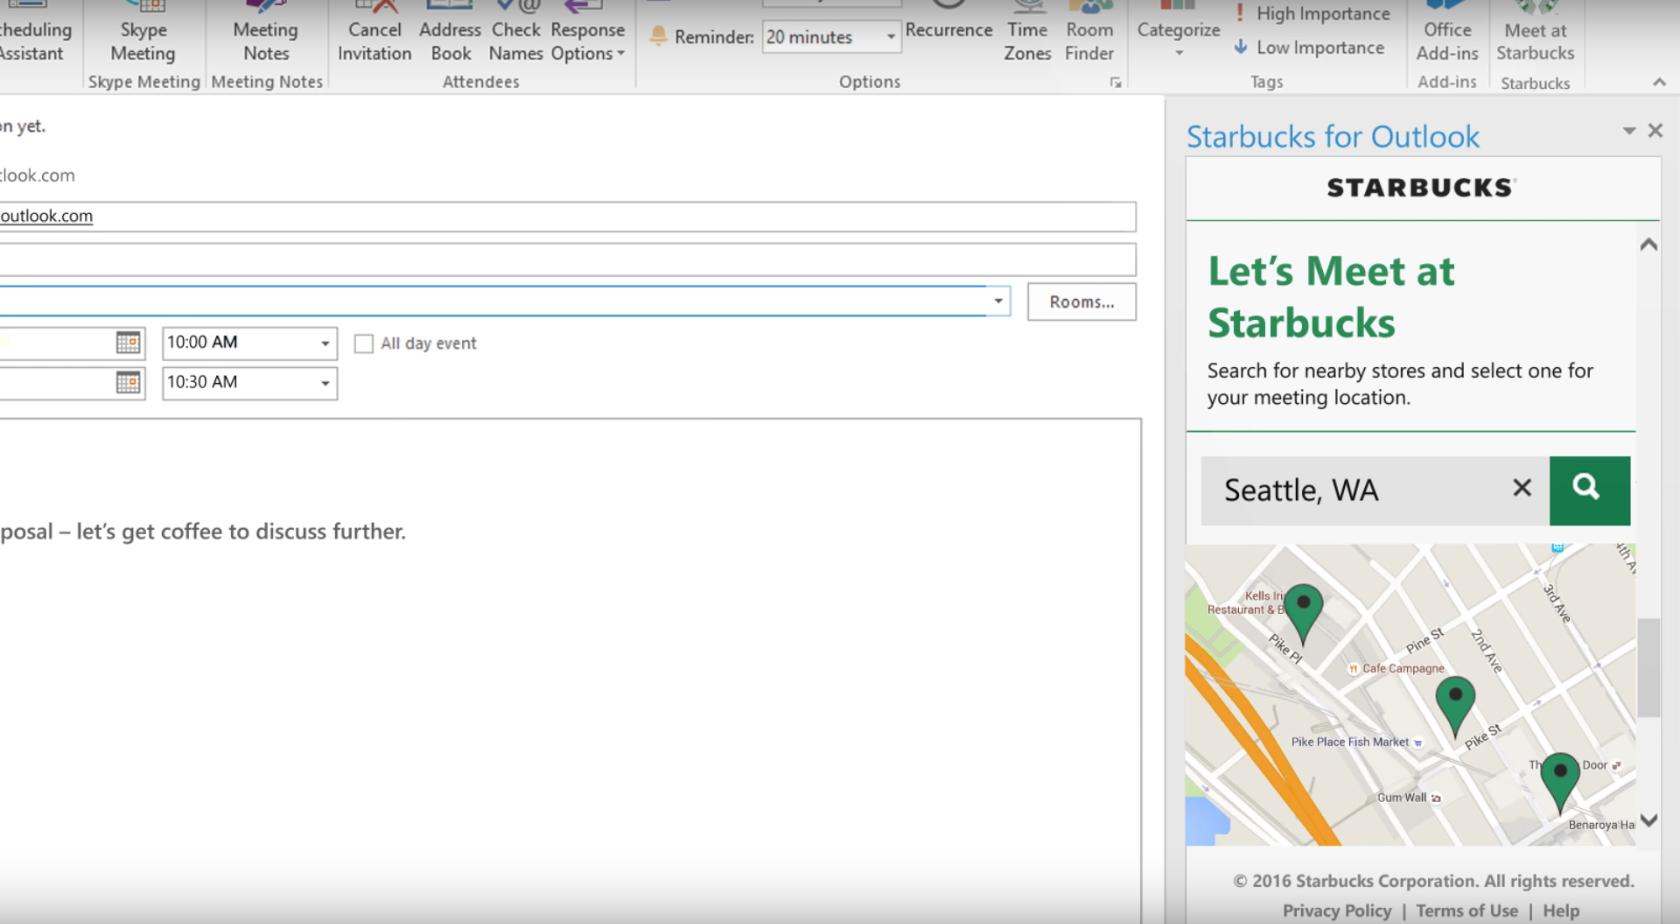 Starbucks Outlook add-in